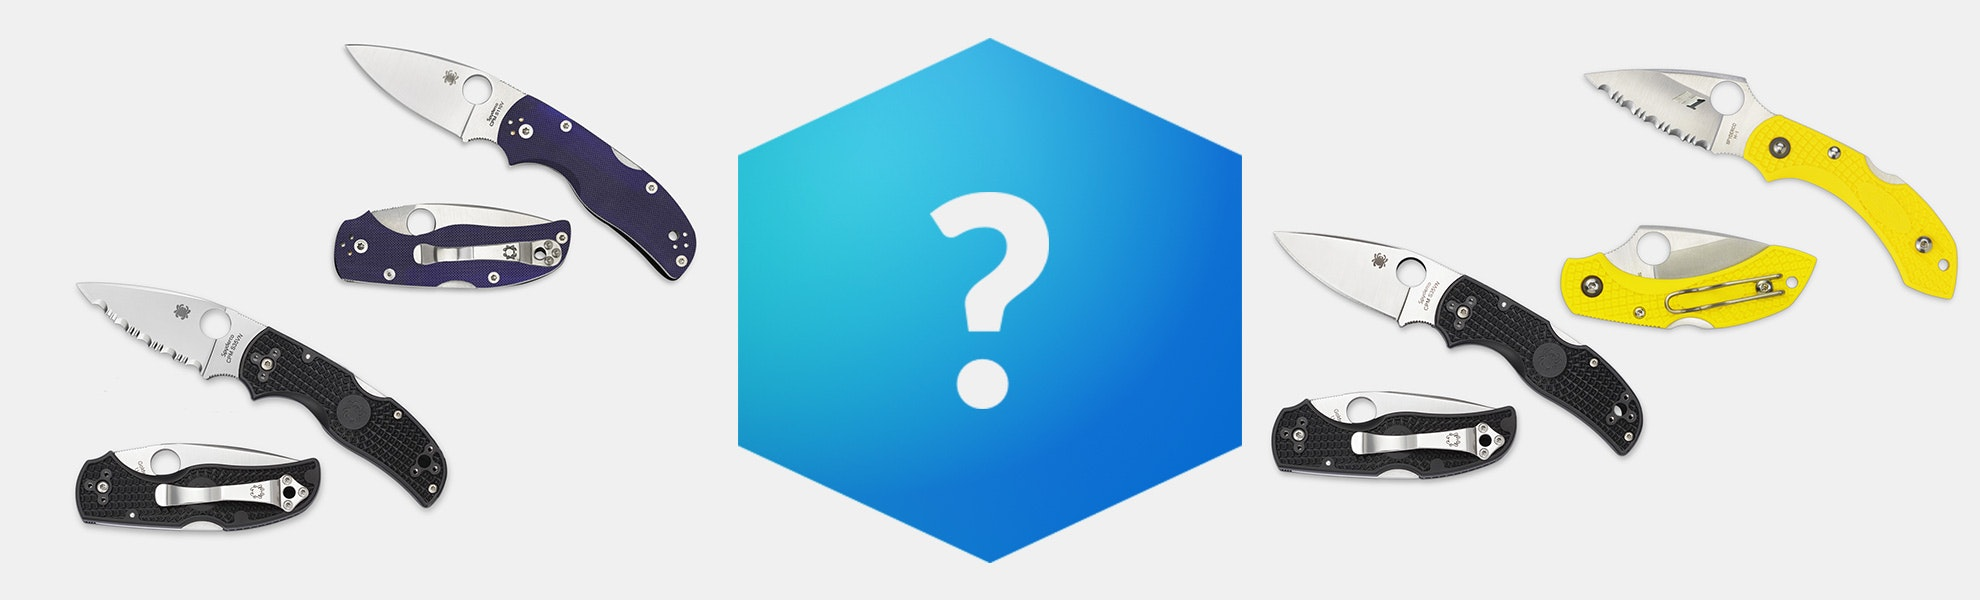 Massdrop Blue Box: Spyderco Native 5